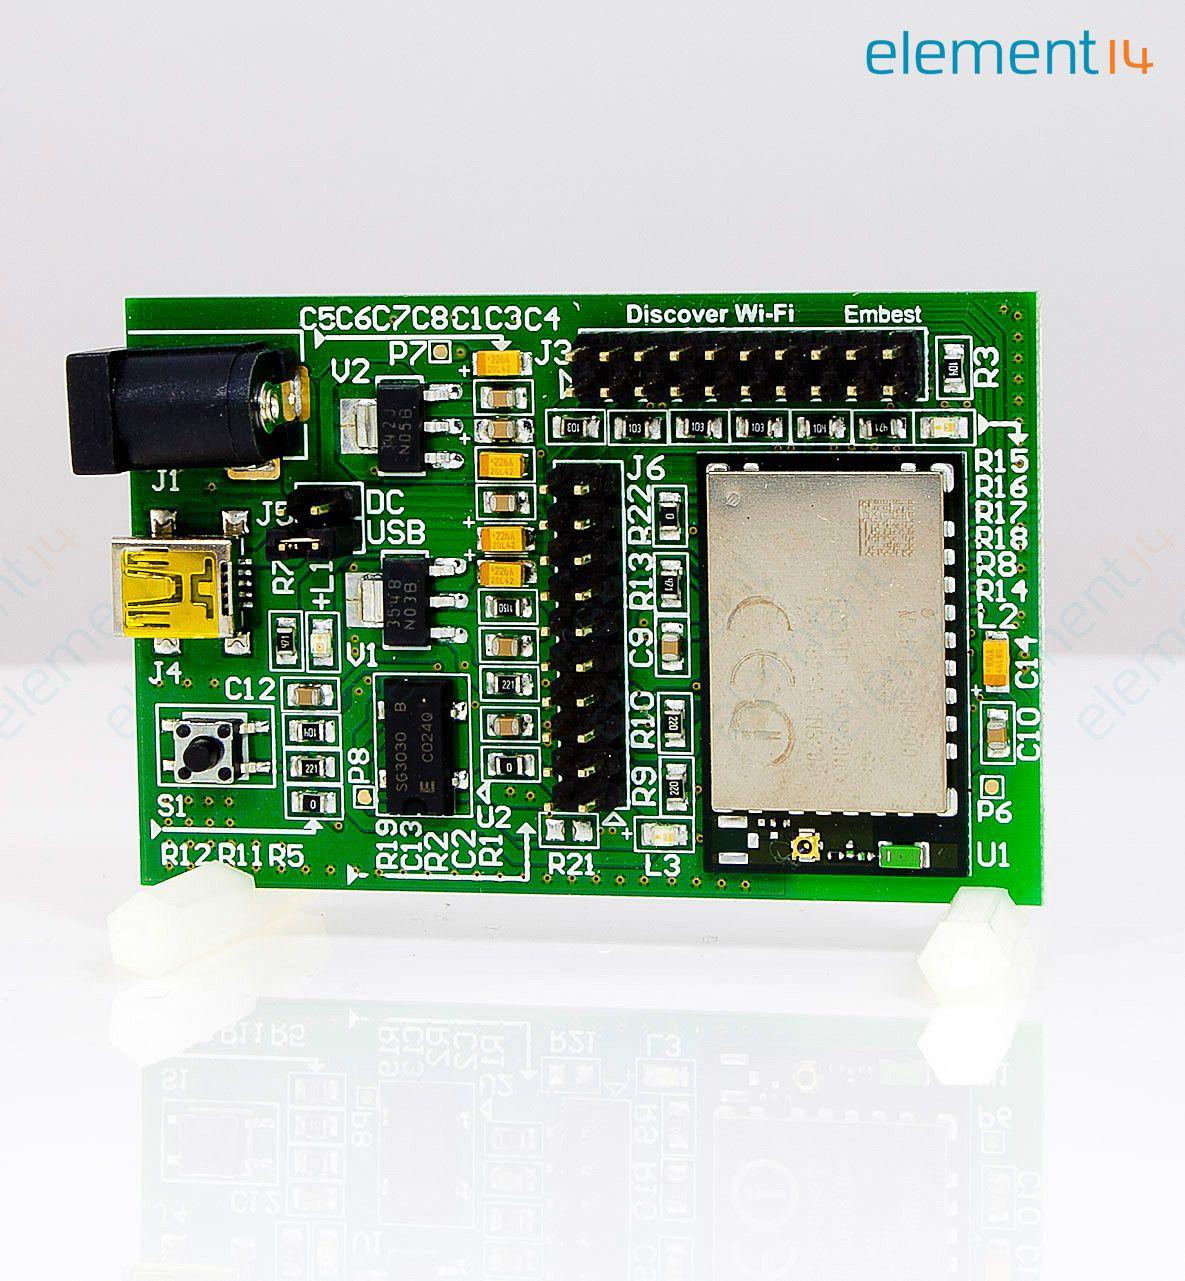 Stm32f4dis Wifi Stmicroelectronics Add On Board Stm32f4 Circuit Richmedia 372kb En